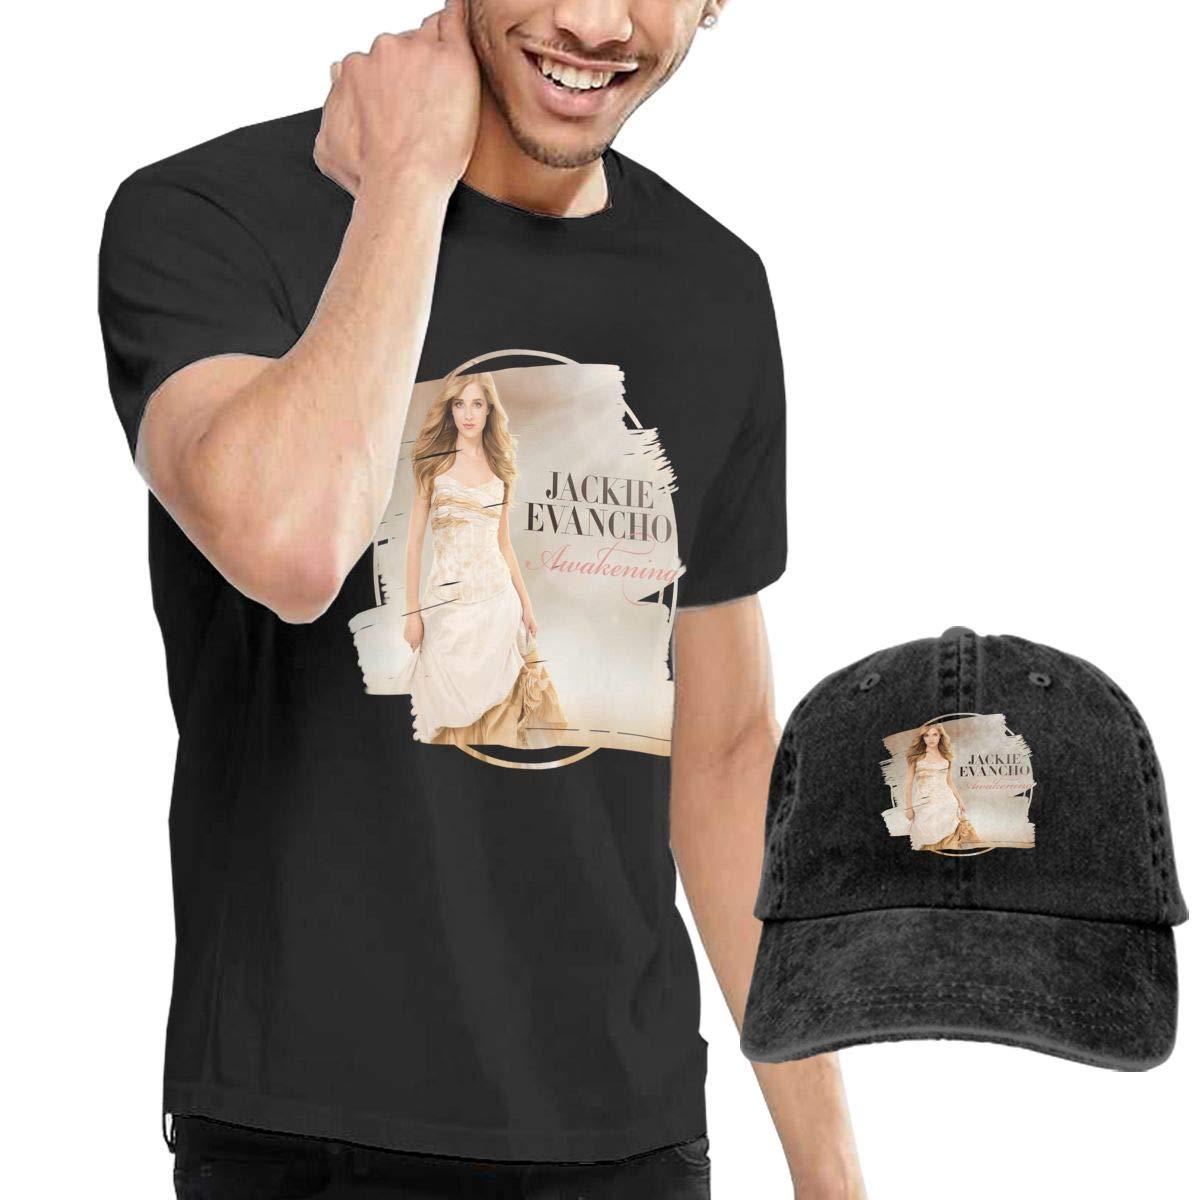 RKUQUVNTAO Mens Jackie Evancho Awakening T Shirt and Washed Denim Baseball Dad Hat Black